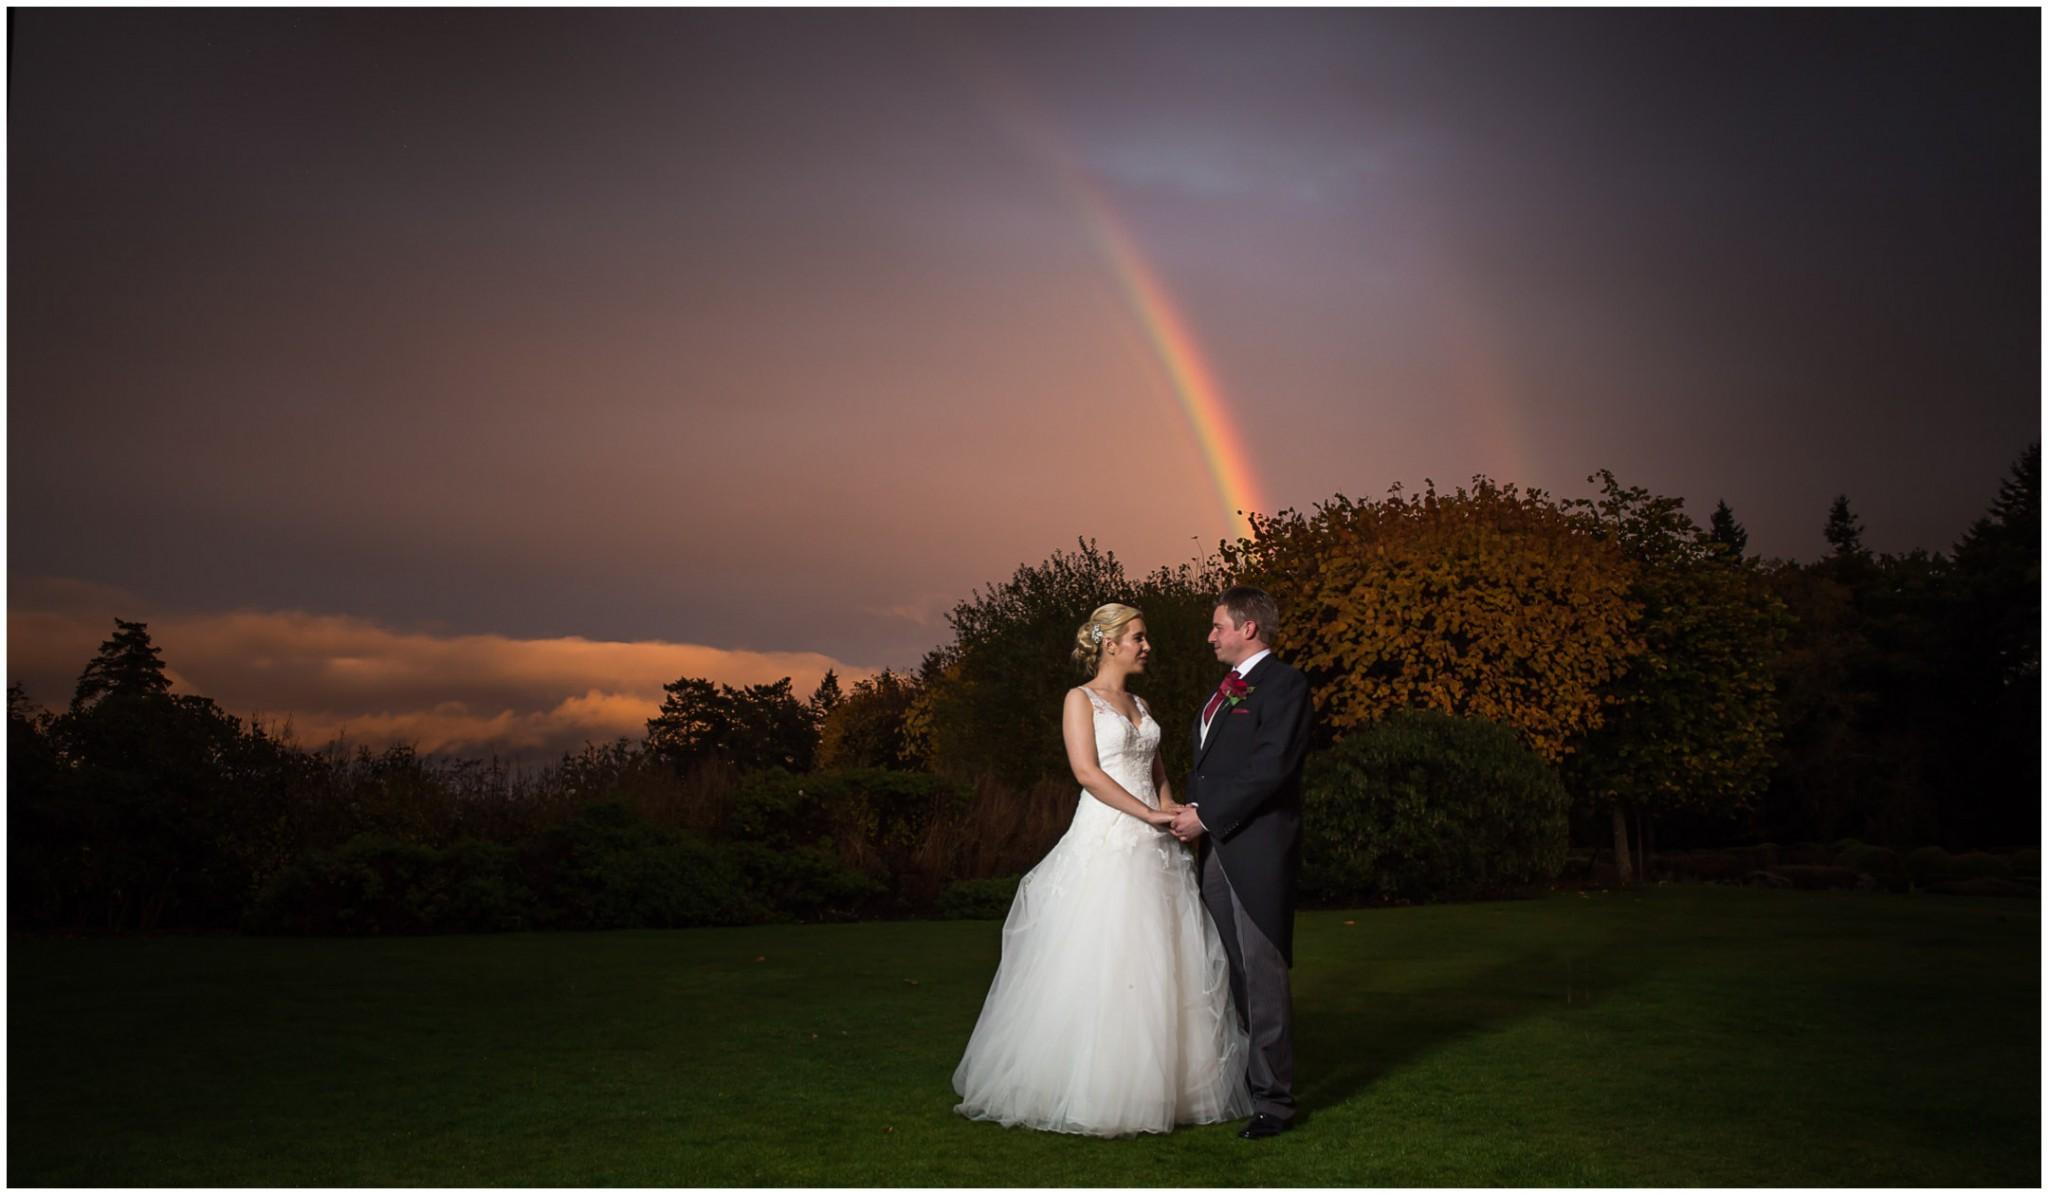 Rhinefield House Wedding Bride & Groom rainbow sunset